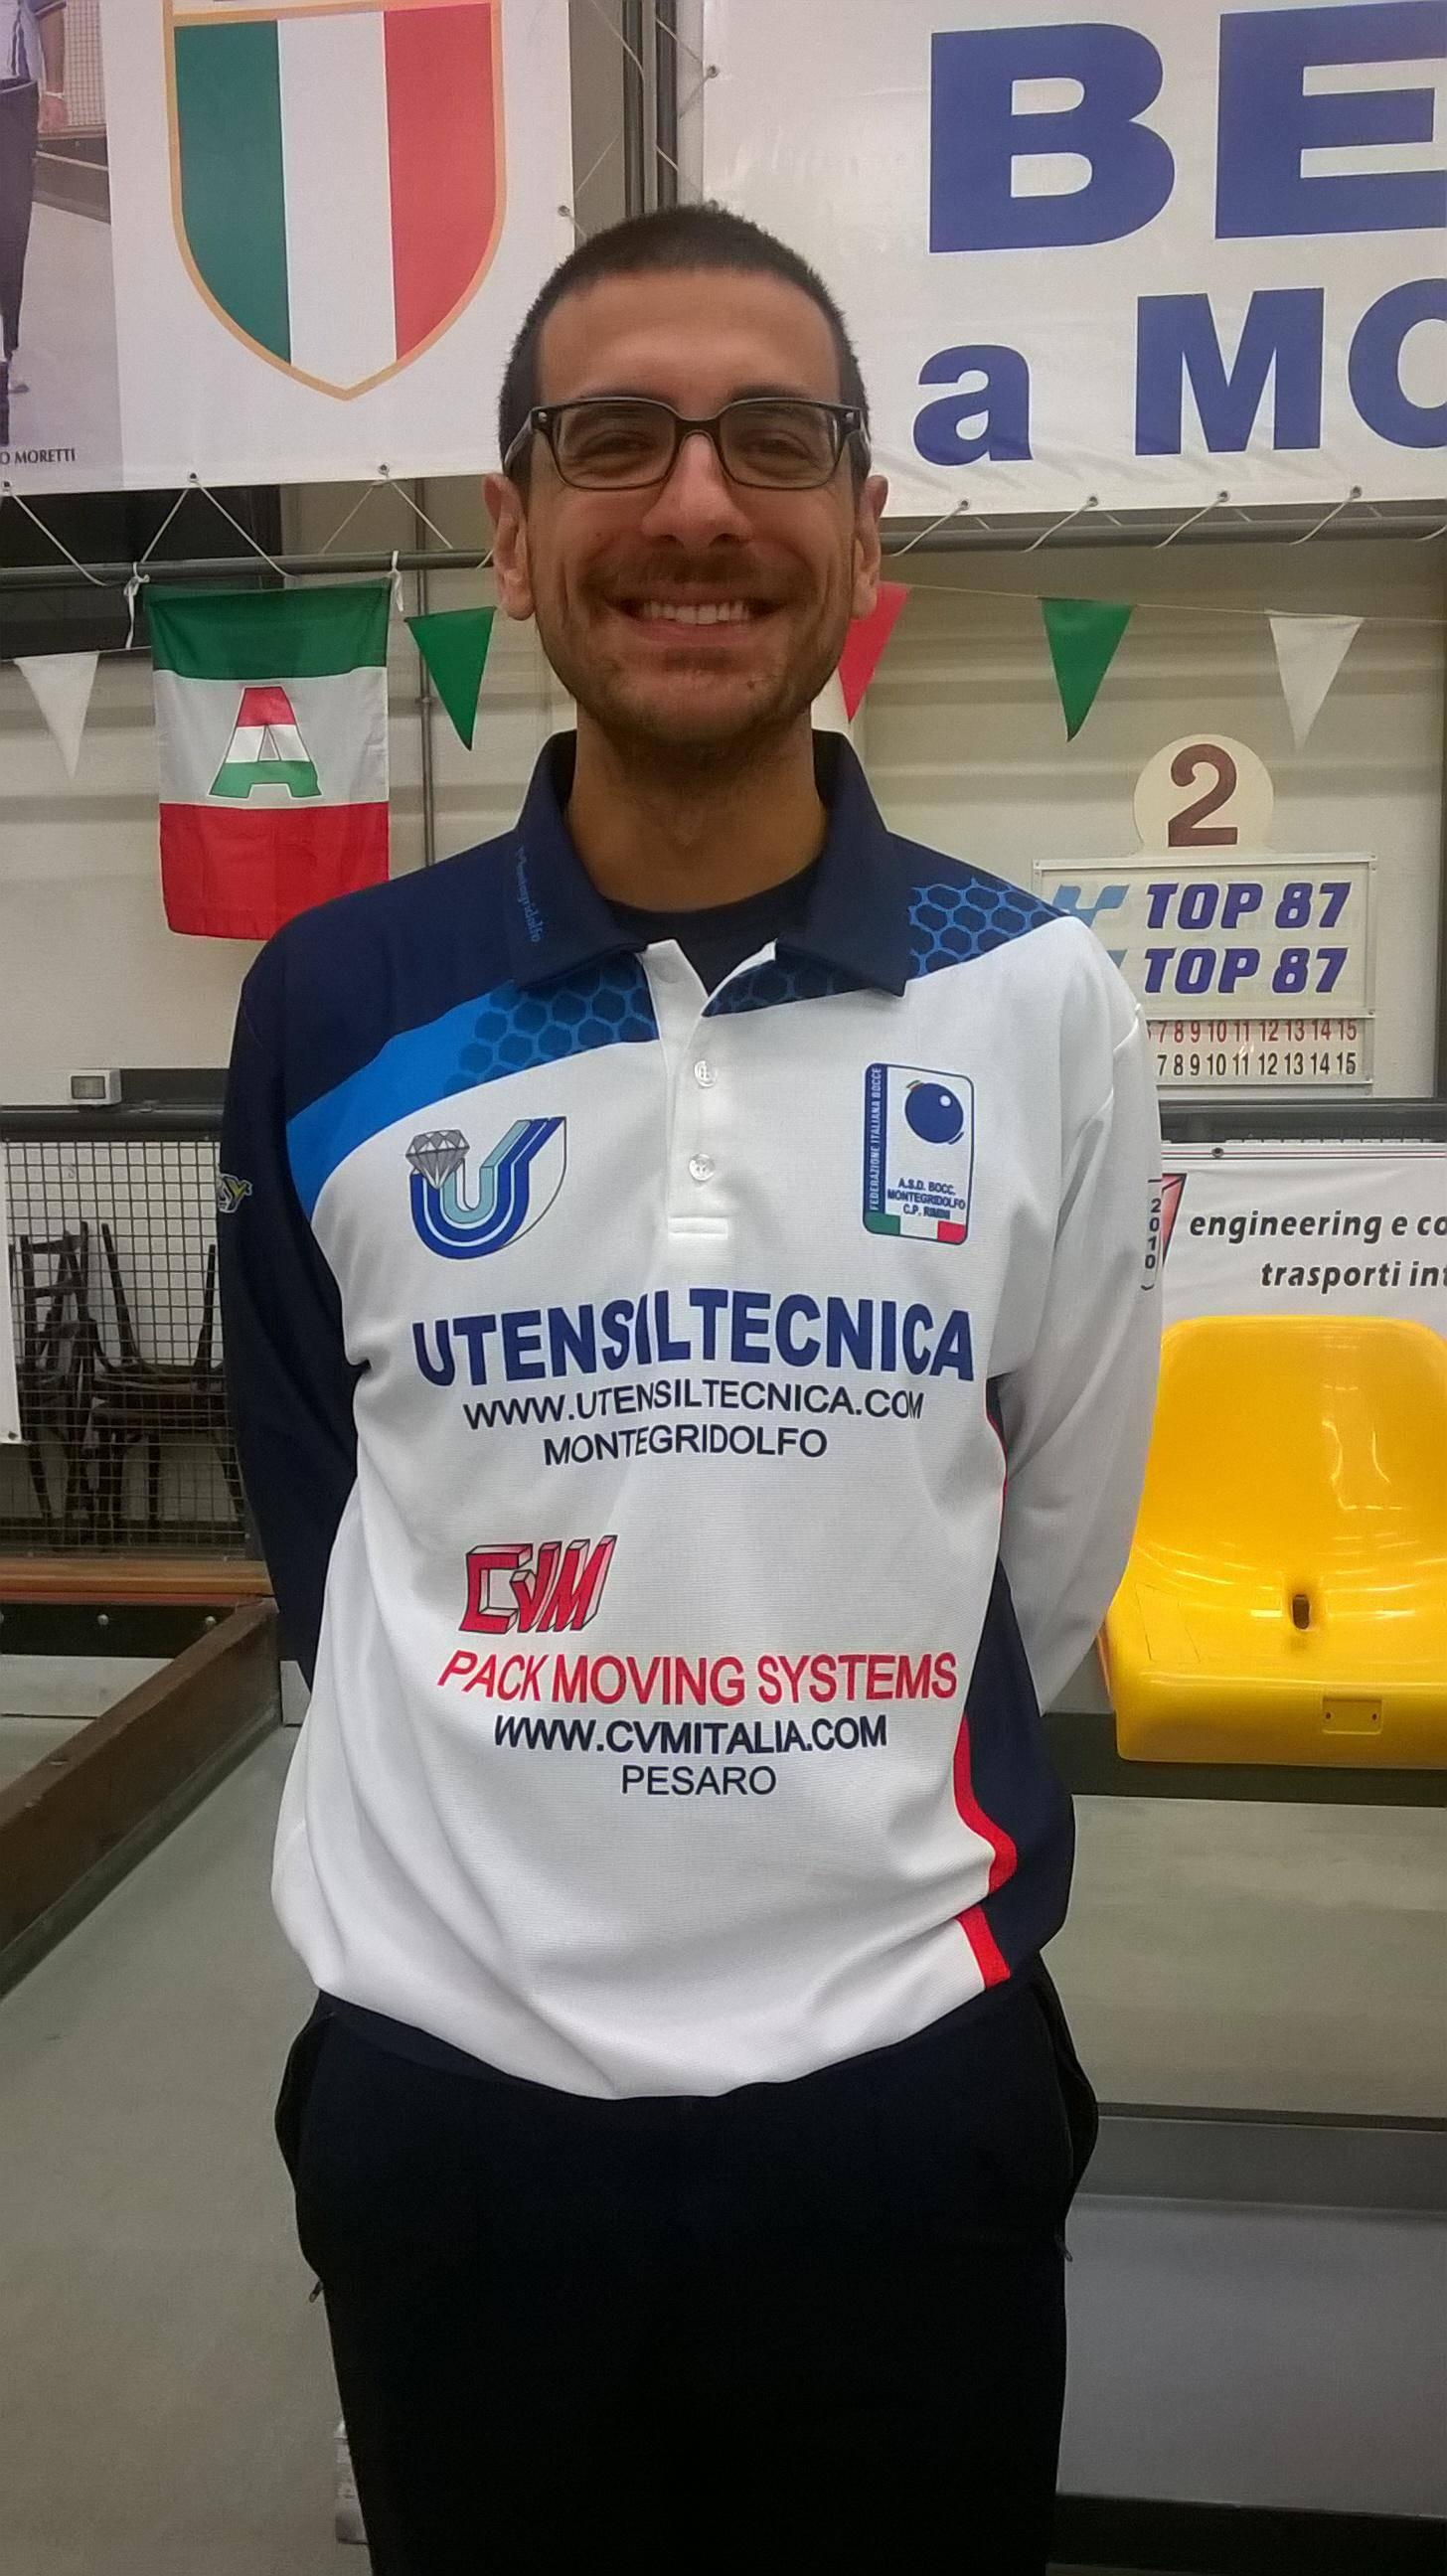 CVM Utensiltecnica Montegridolfo-Ancona 2000 4-0